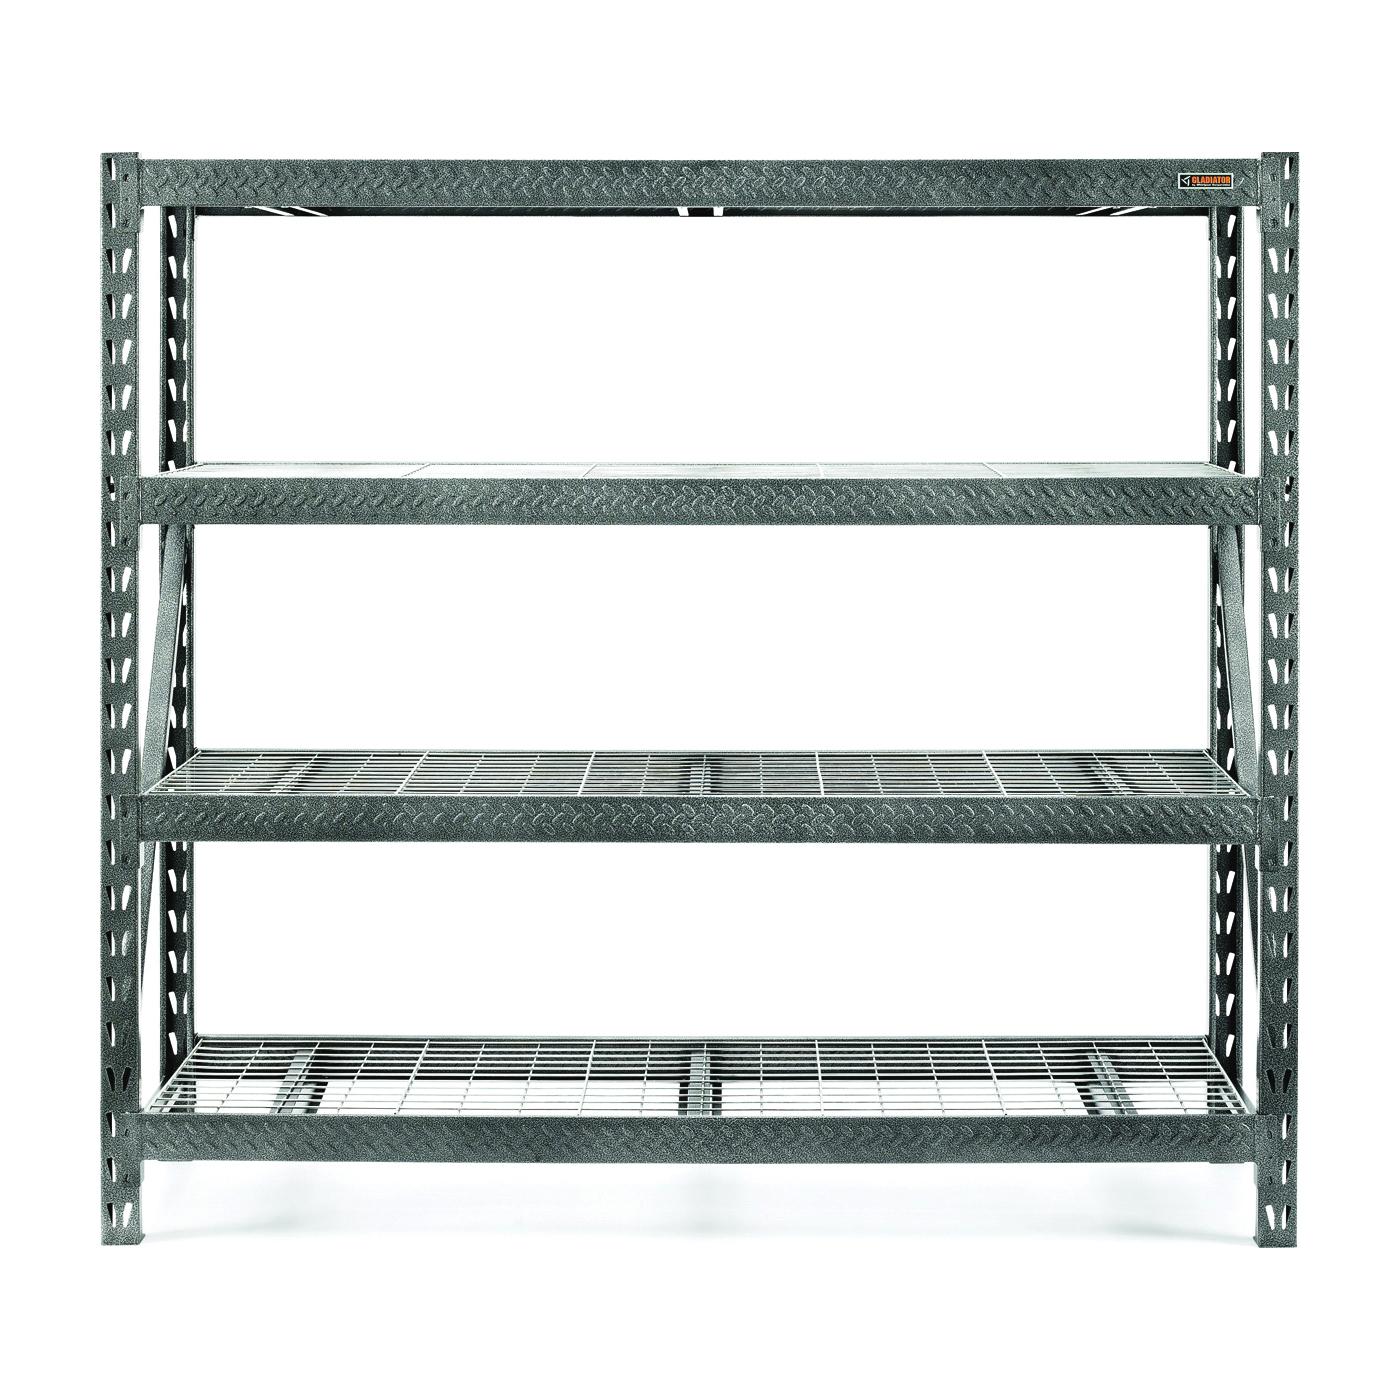 Picture of GLADIATOR GARS774XEG Rack Shelf, 8000 lb Capacity, 4-Shelf, 77 in OAW, 24 in OAD, 72 in OAH, Hammered Granite